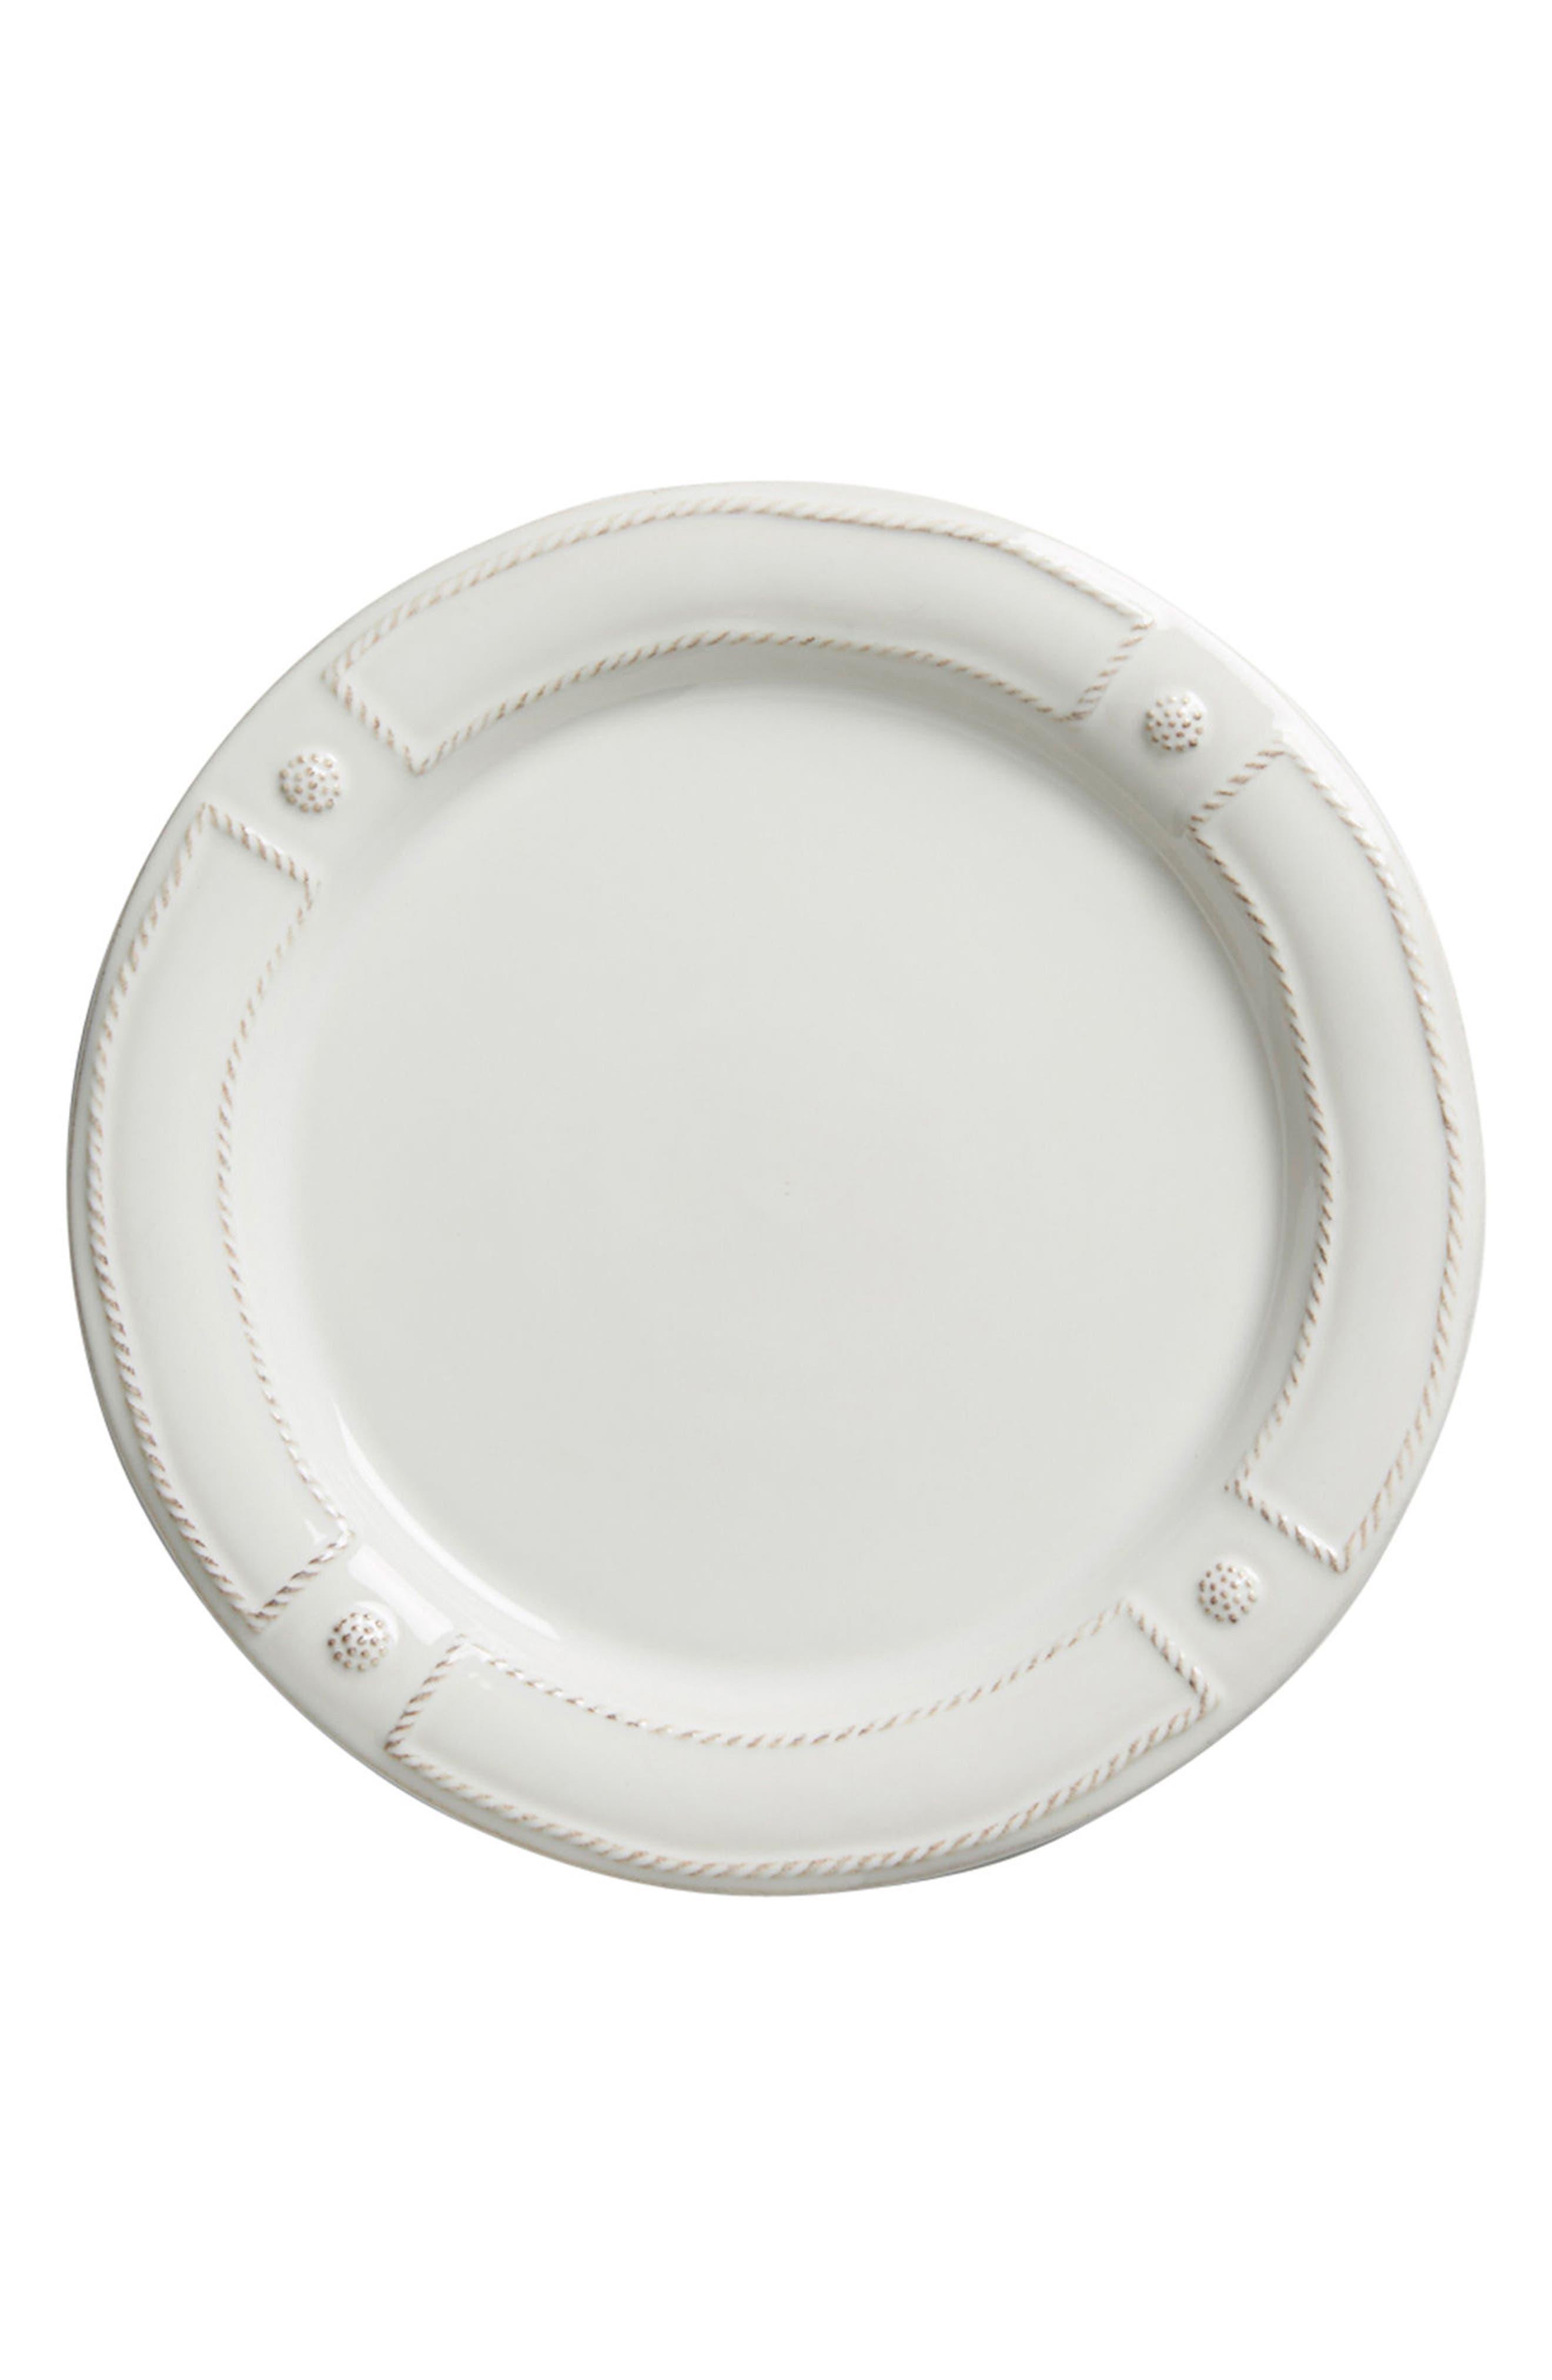 Berry & Thread Dinner Plate,                             Main thumbnail 1, color,                             WHITEWASH